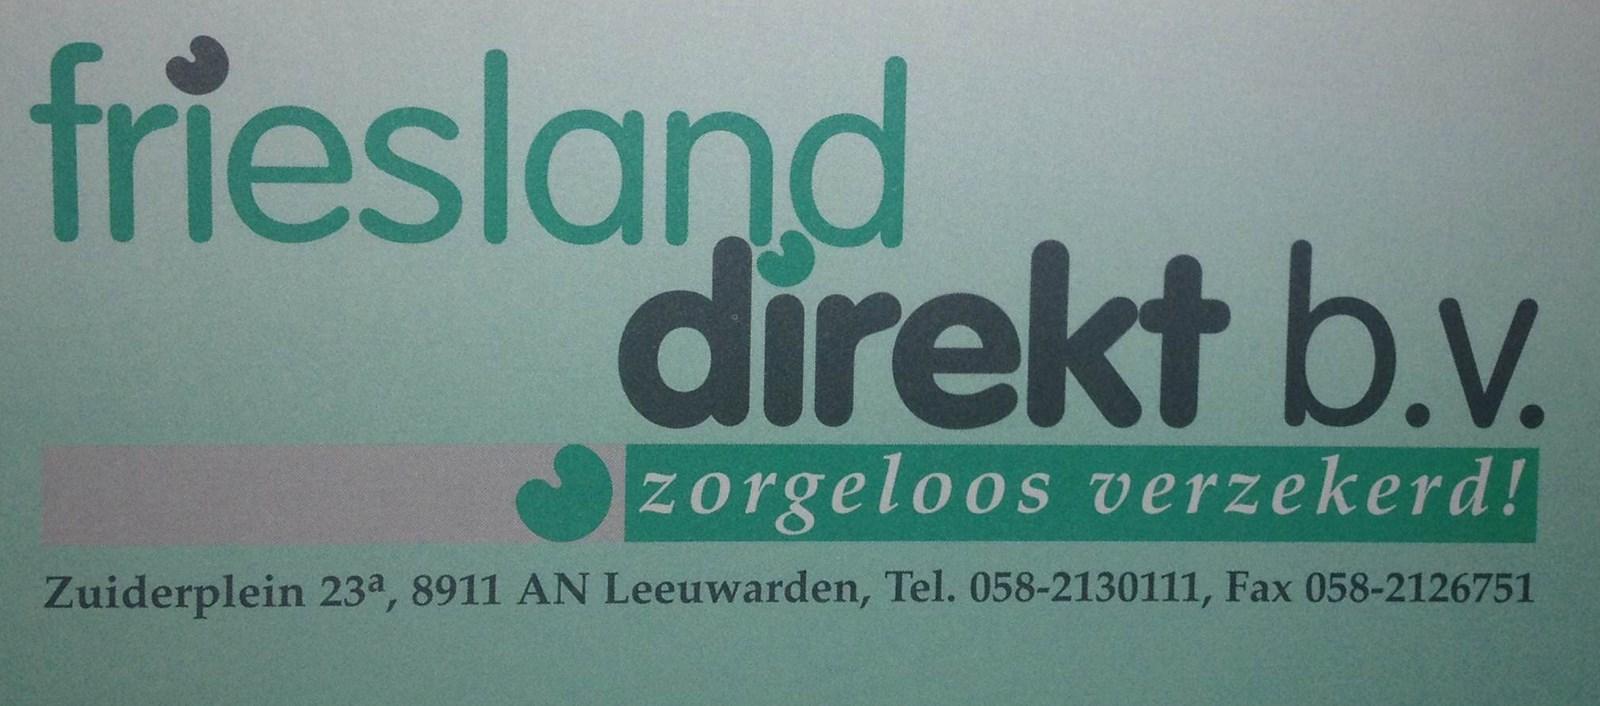 Afbeelding van Friesland Direkt B.V.